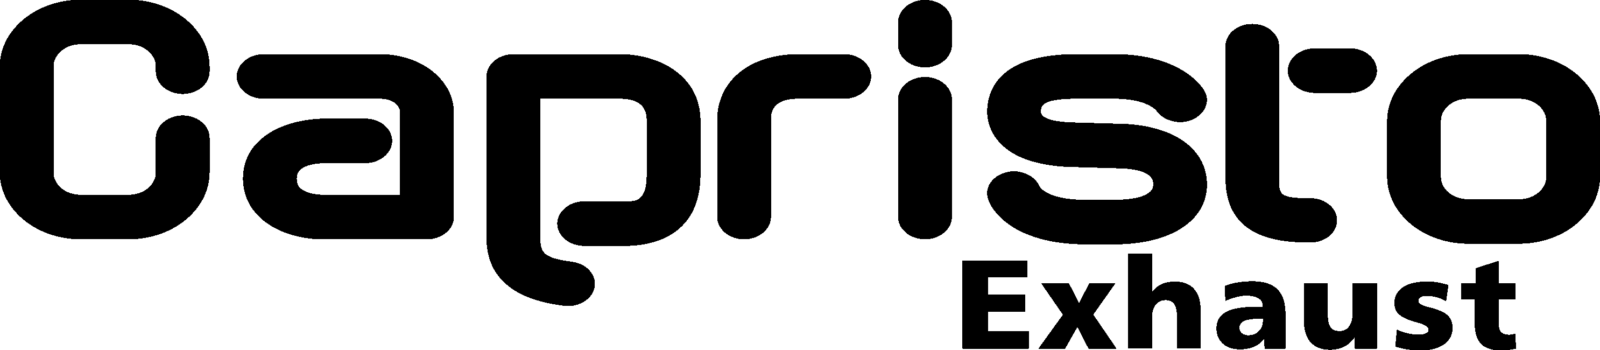 capristo logo